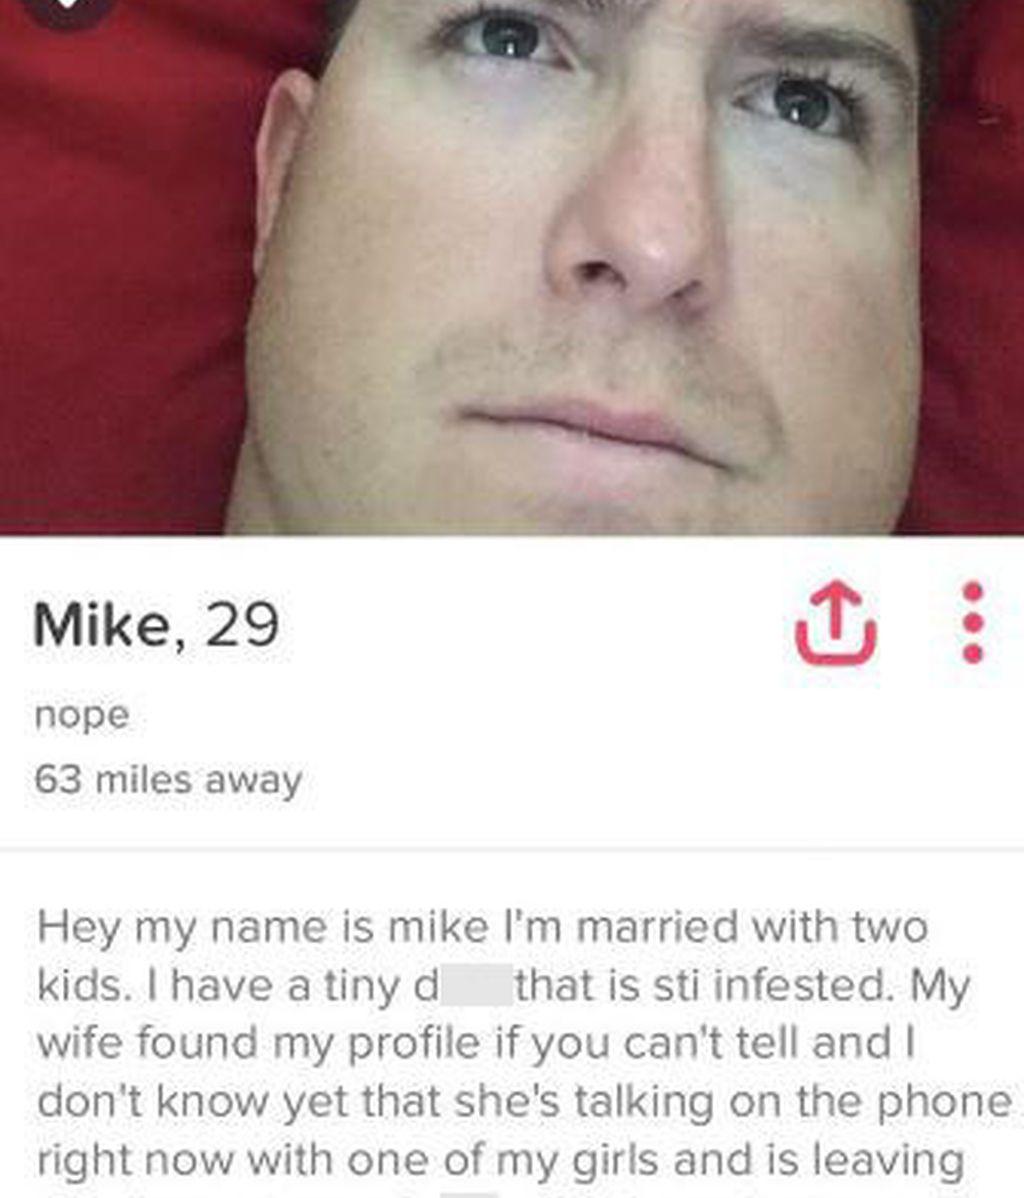 Se venga de su marido tras descubrir que le era infiel en Tinder